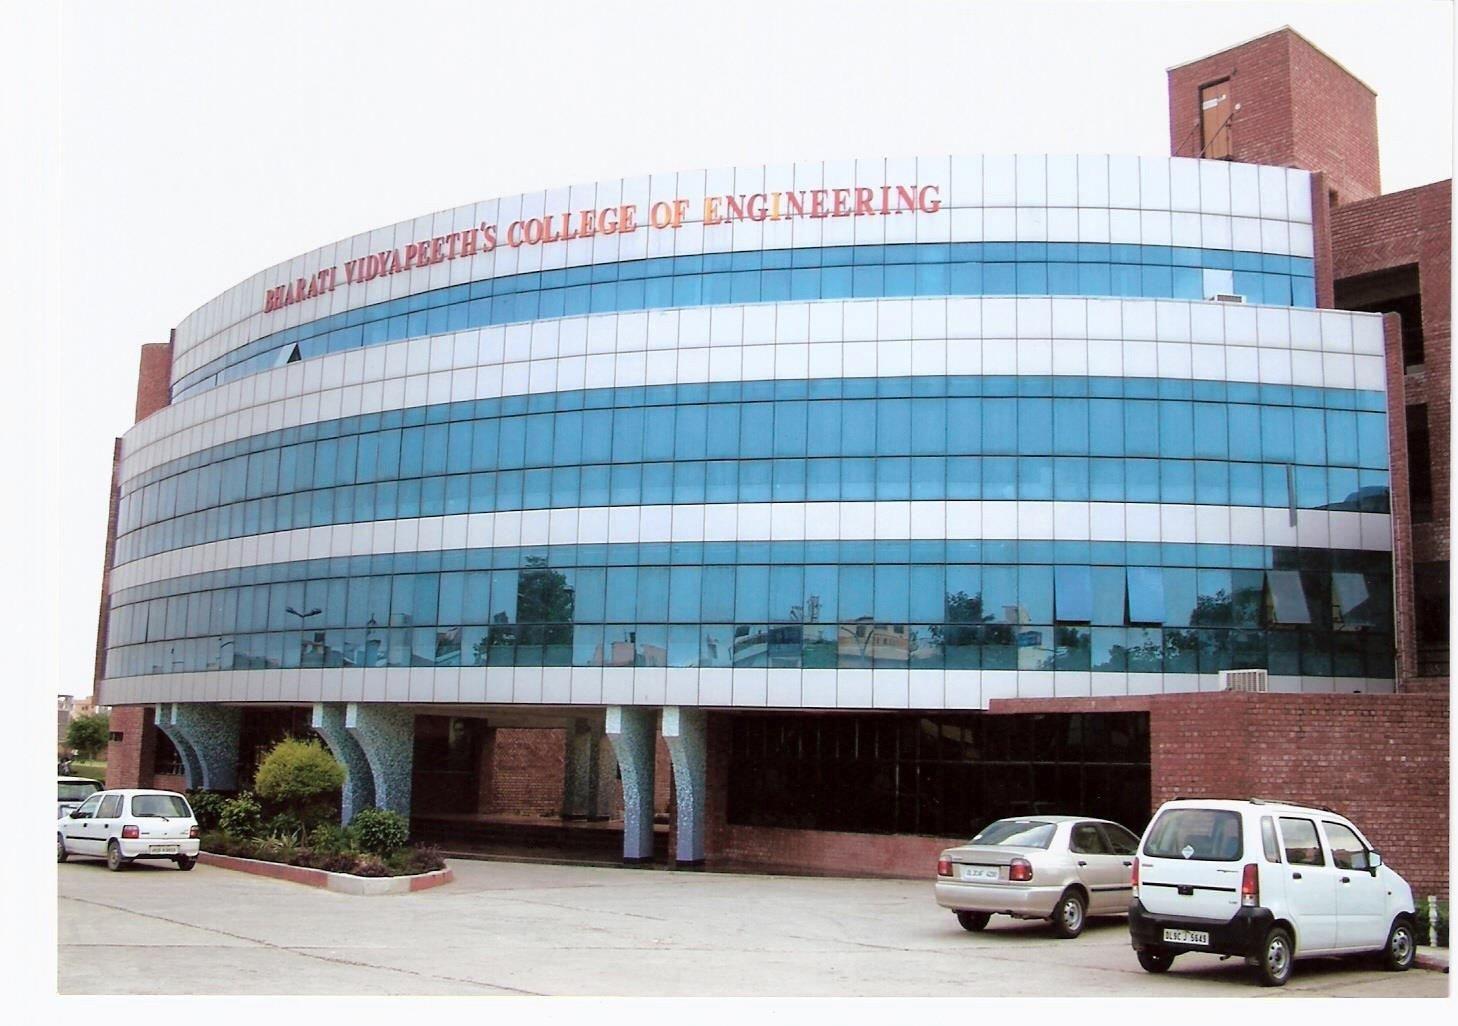 Bharati Vidyapeeth's College of Engineering (BVCOE Delhi)